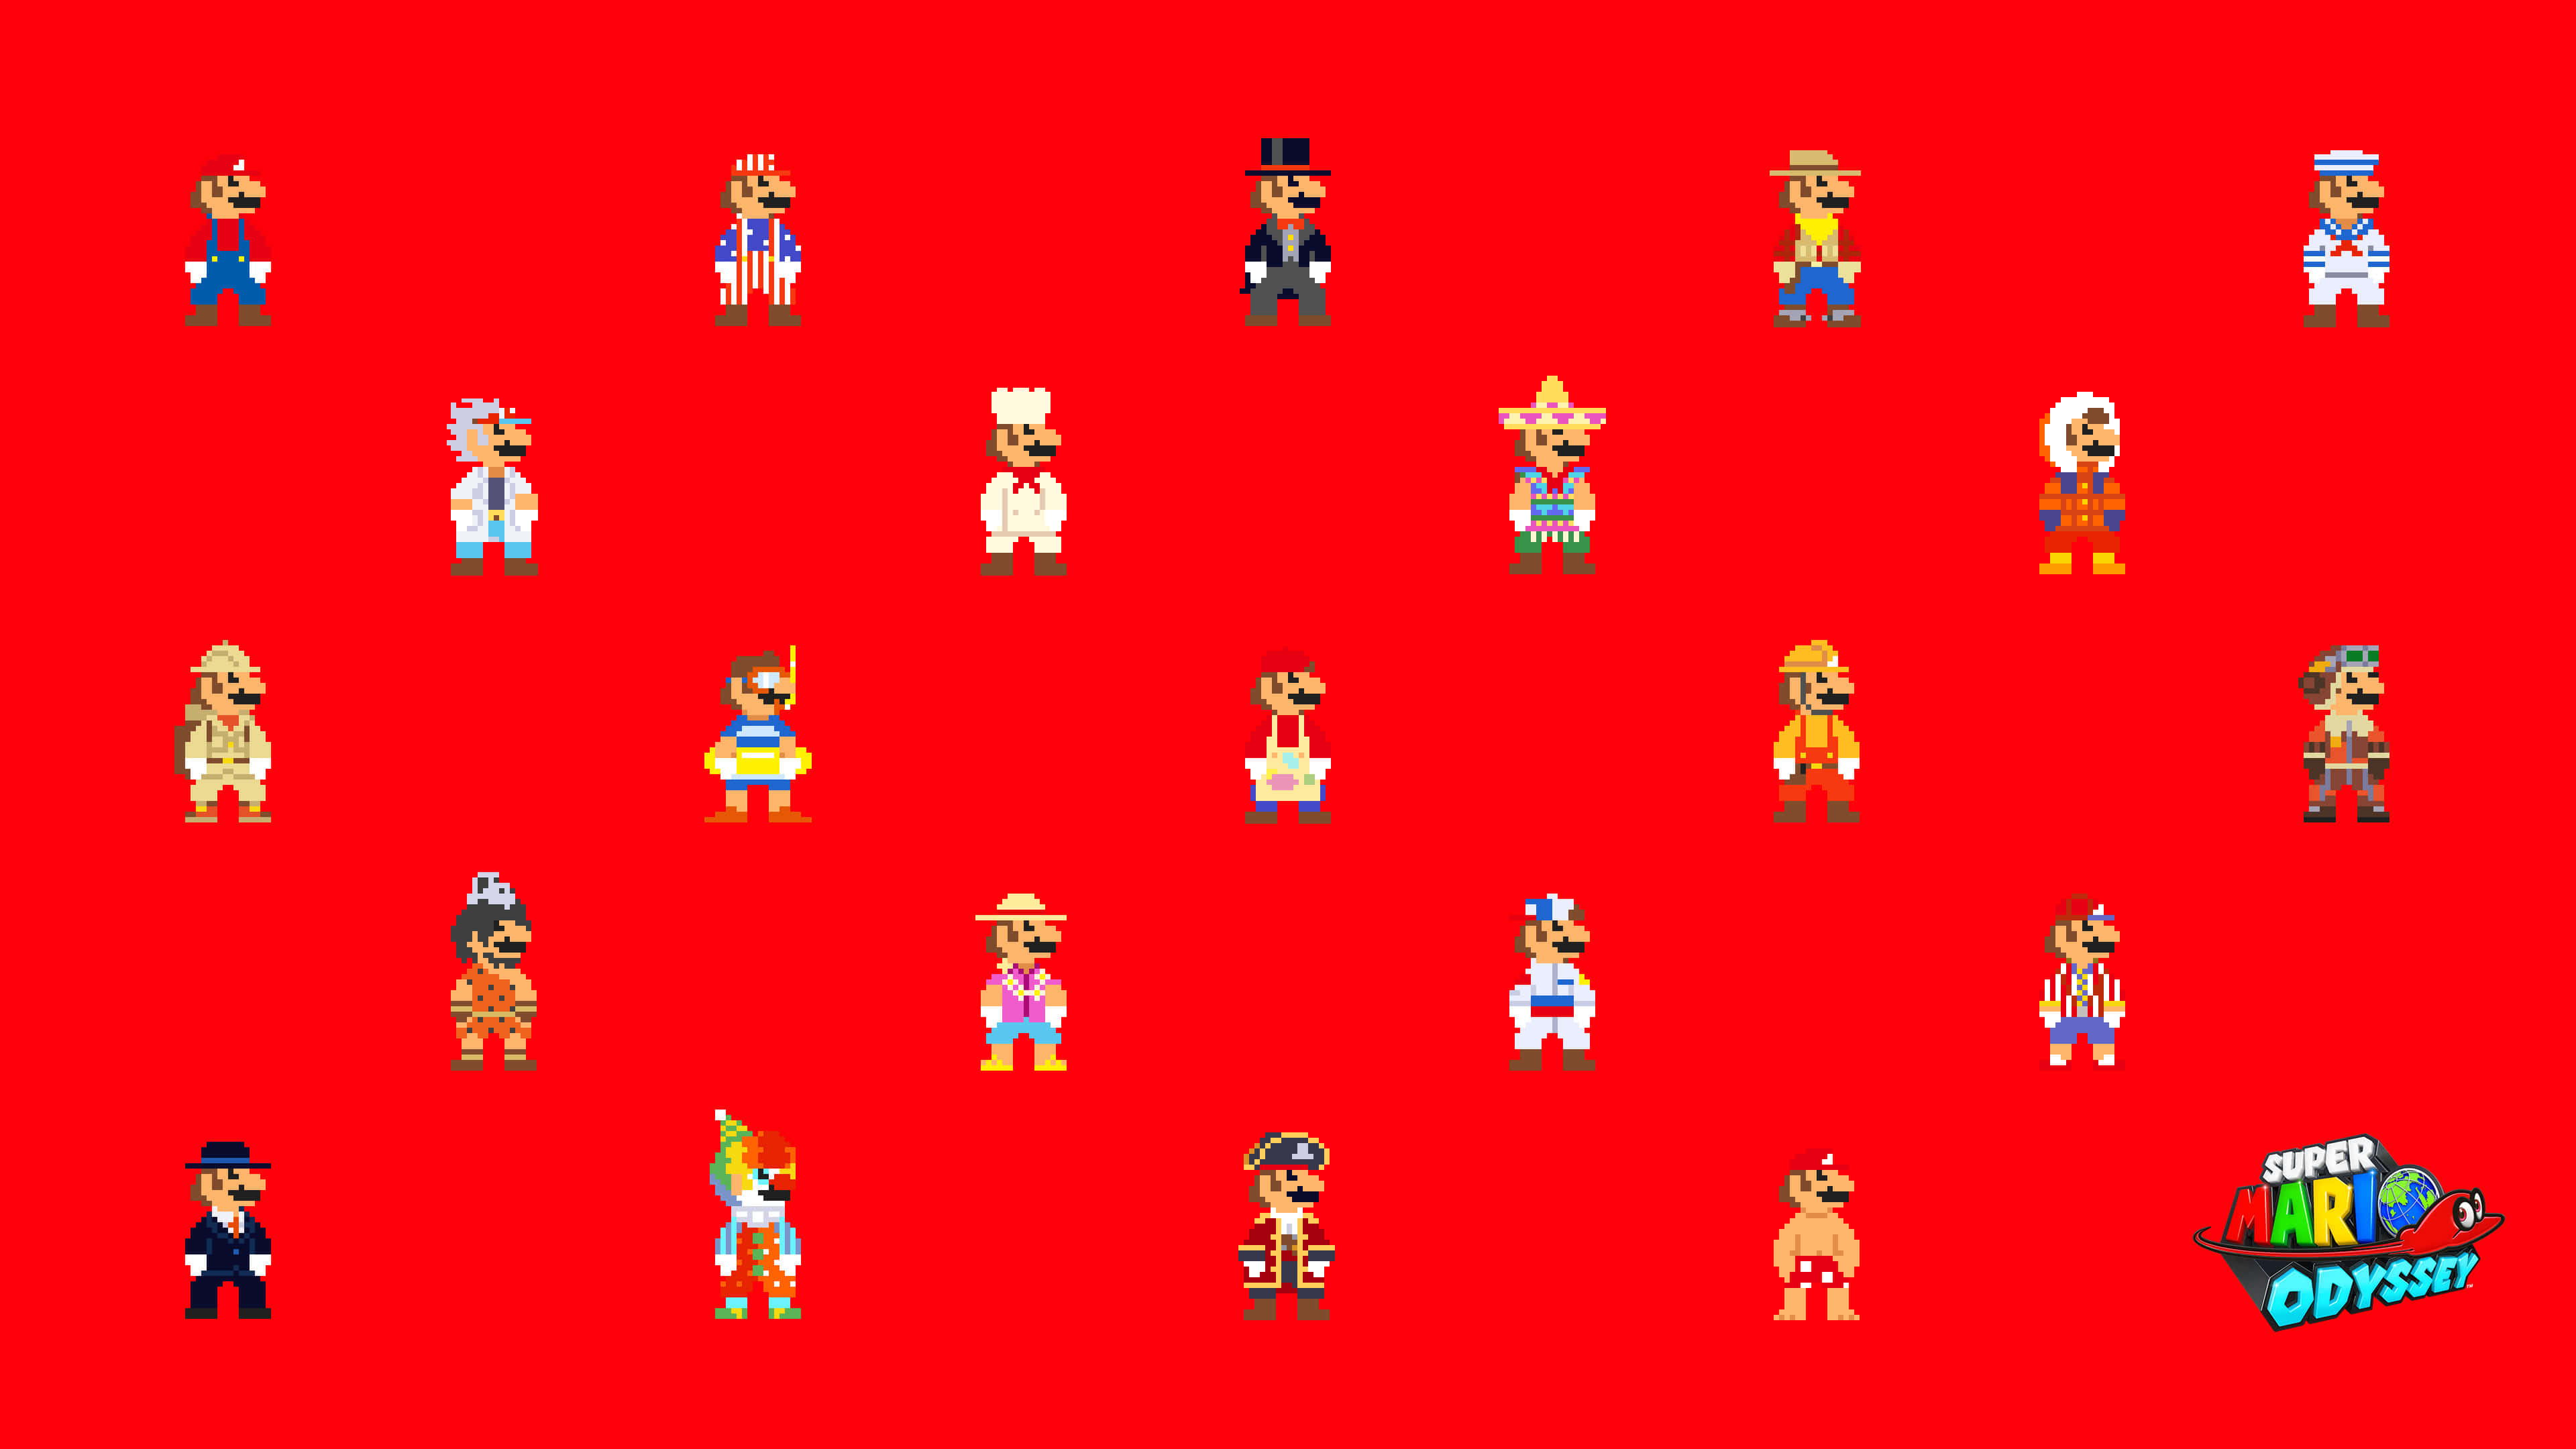 Super Mario Odyssey 8bit Mario Uhd 4k Wallpaper Pixelz